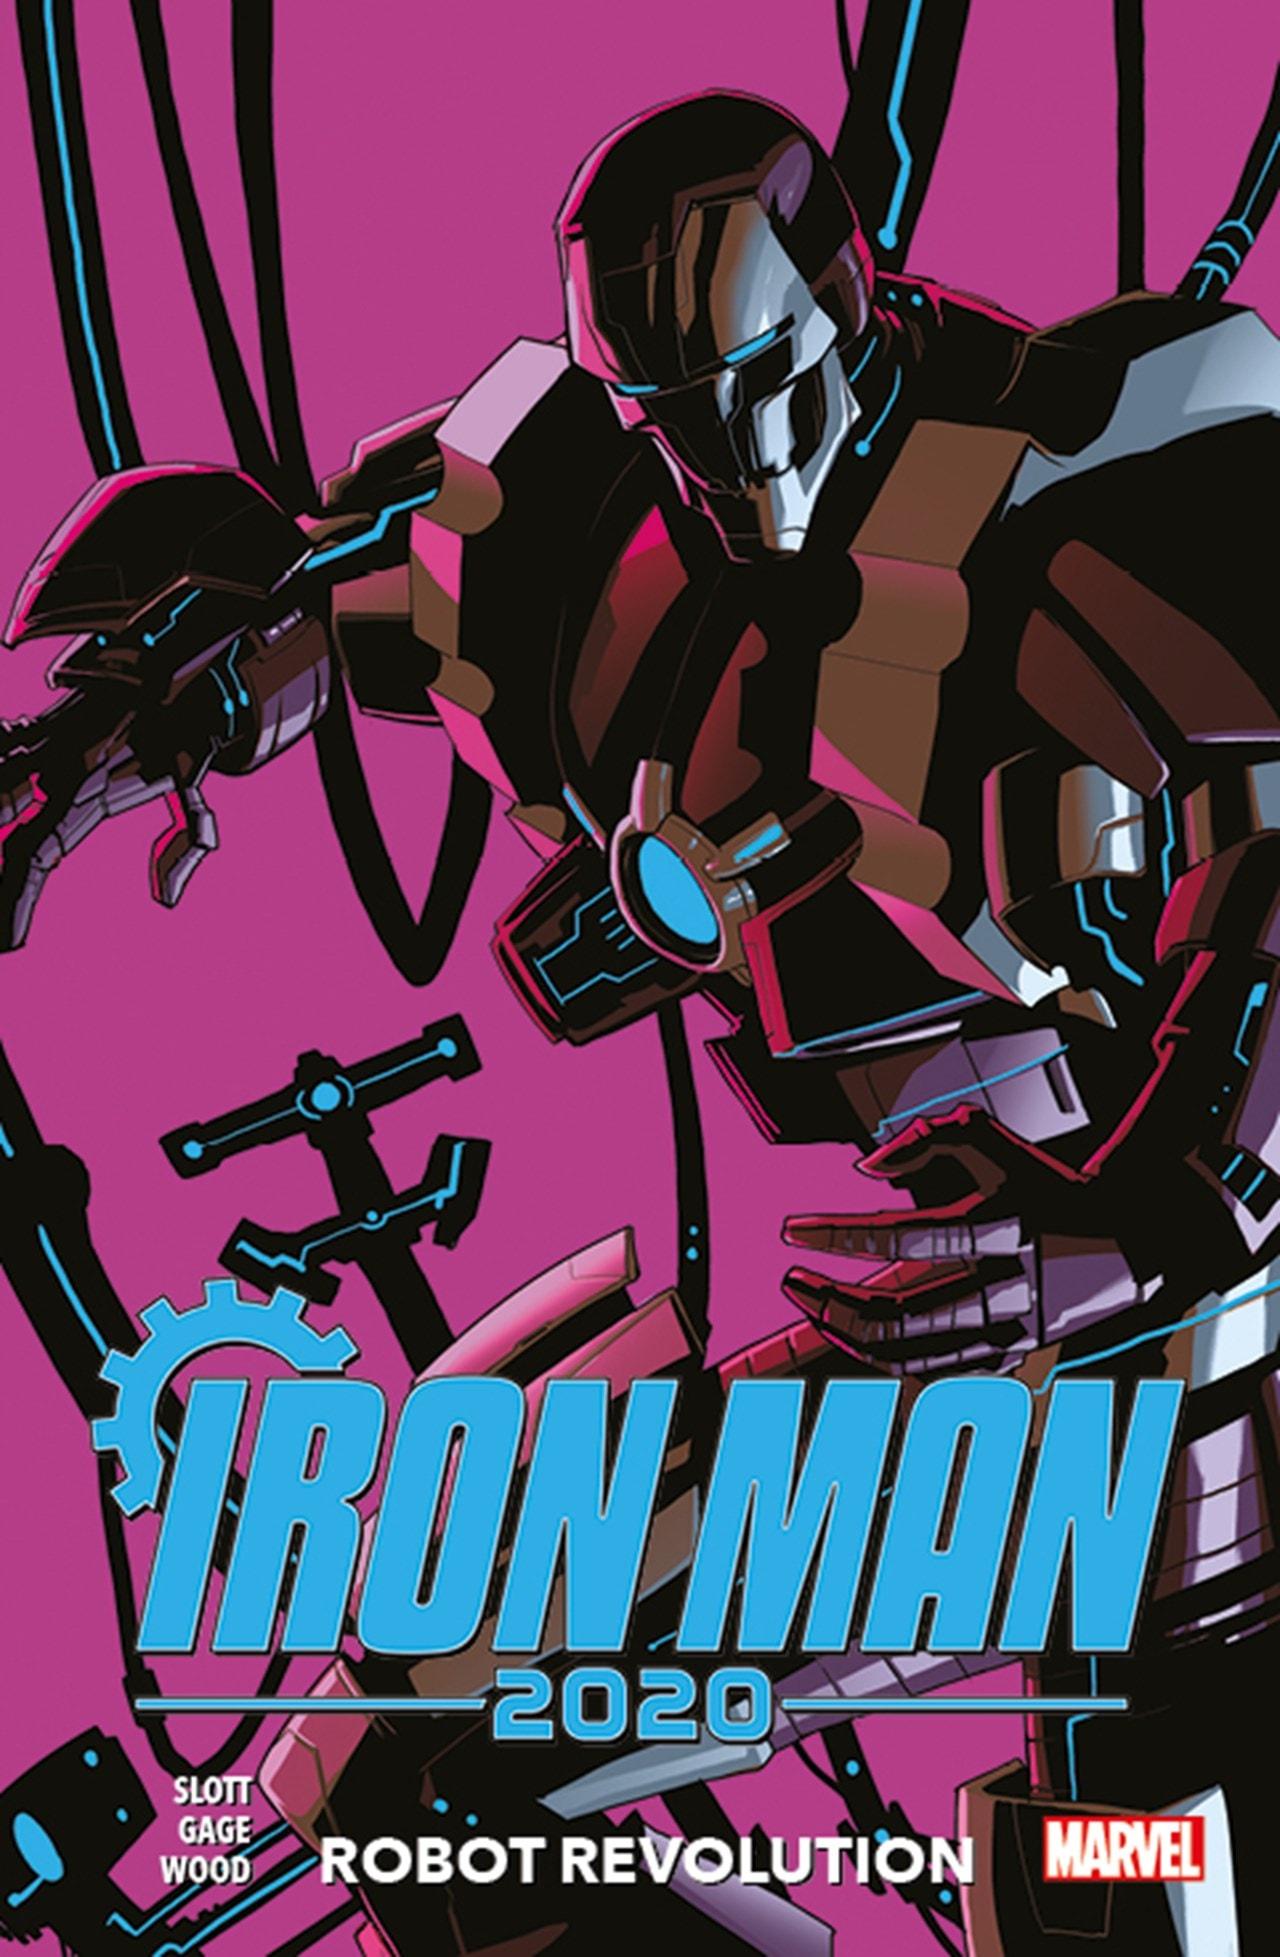 Iron Man 2020 : Robot Revolution - 1